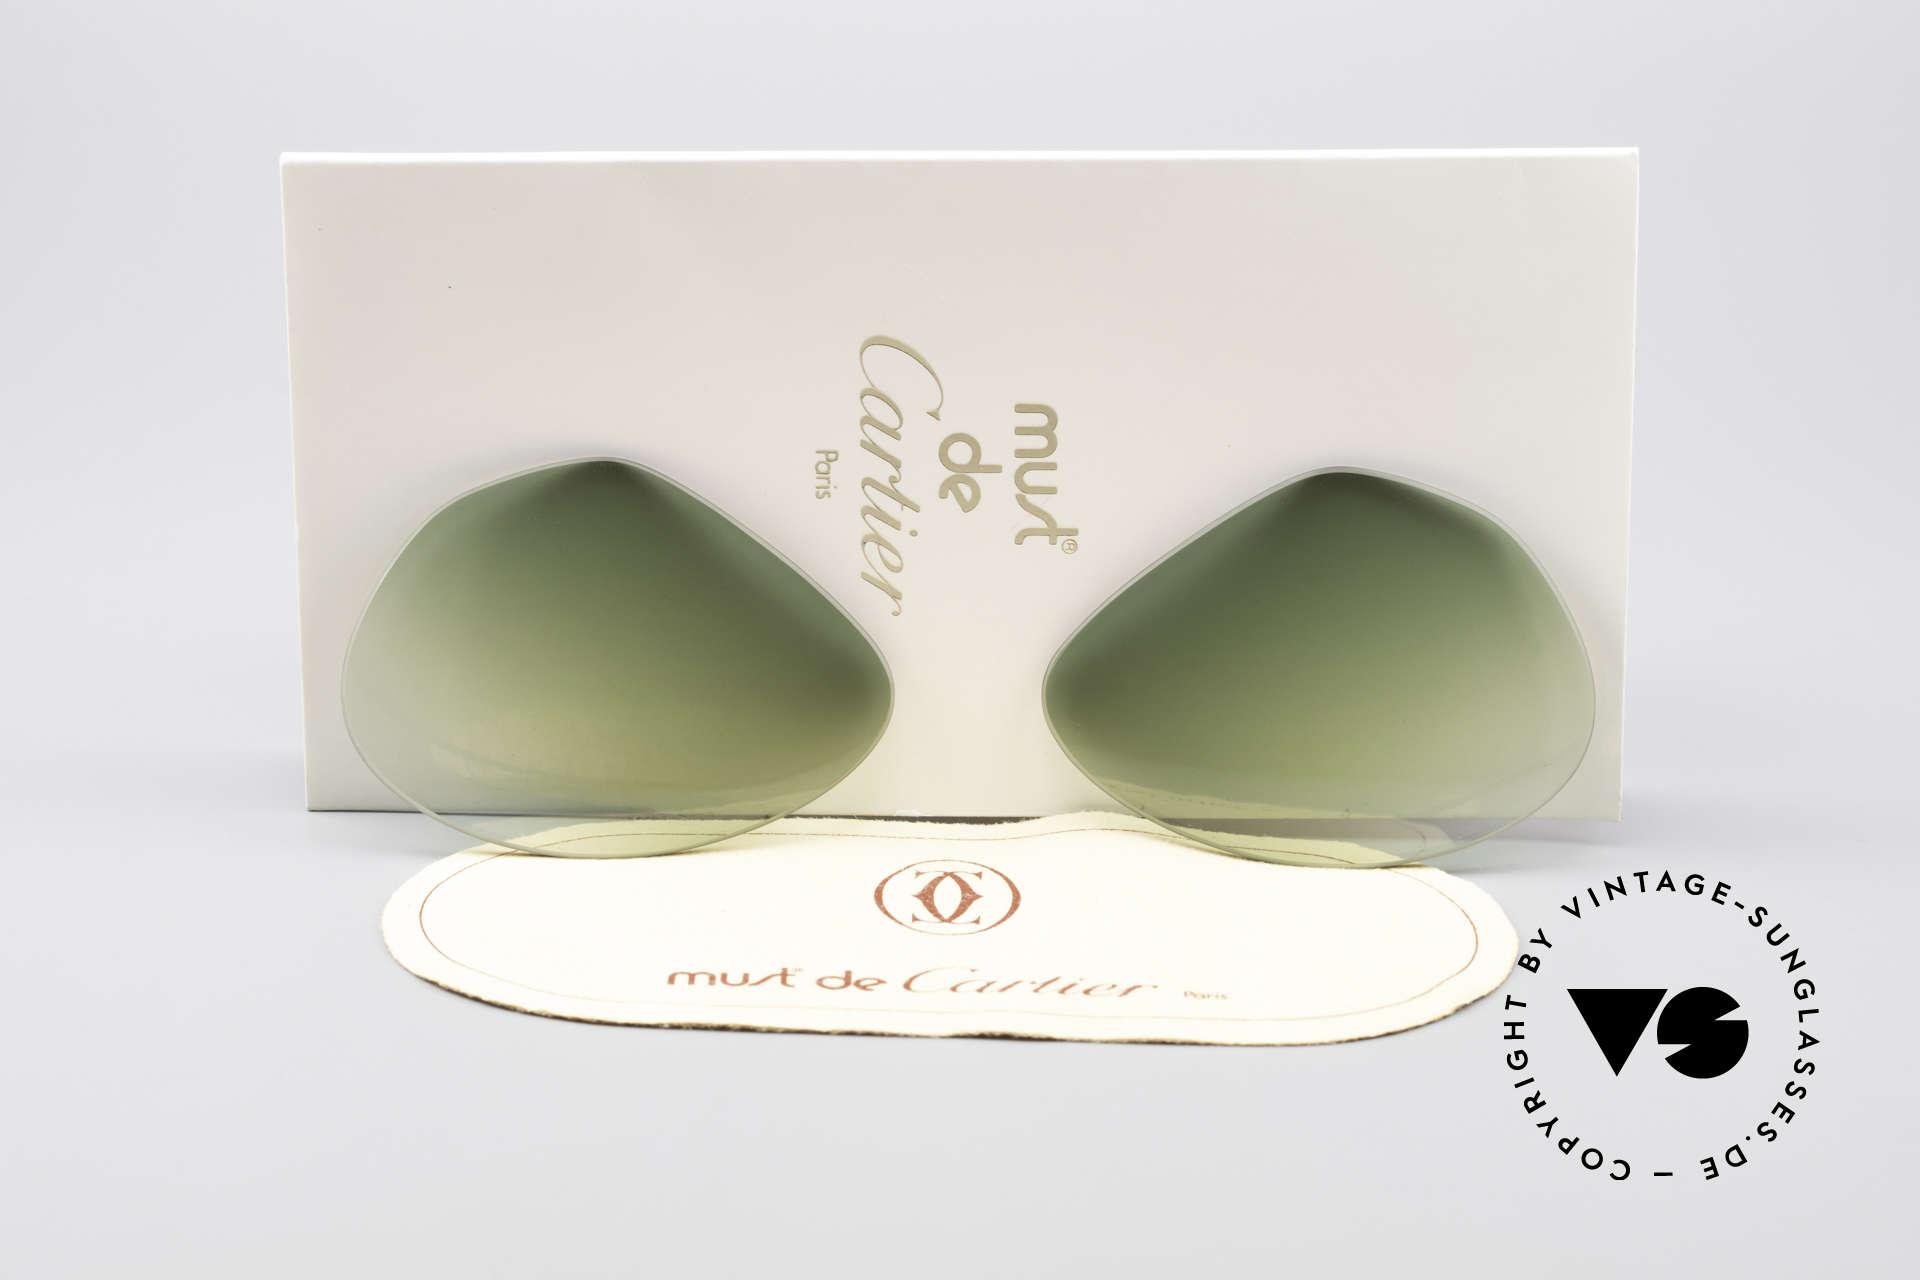 Cartier Vendome Lenses - L Green Gradient Sun Lenses, replacement lenses for Cartier mod. Vendome 62mm size, Made for Men